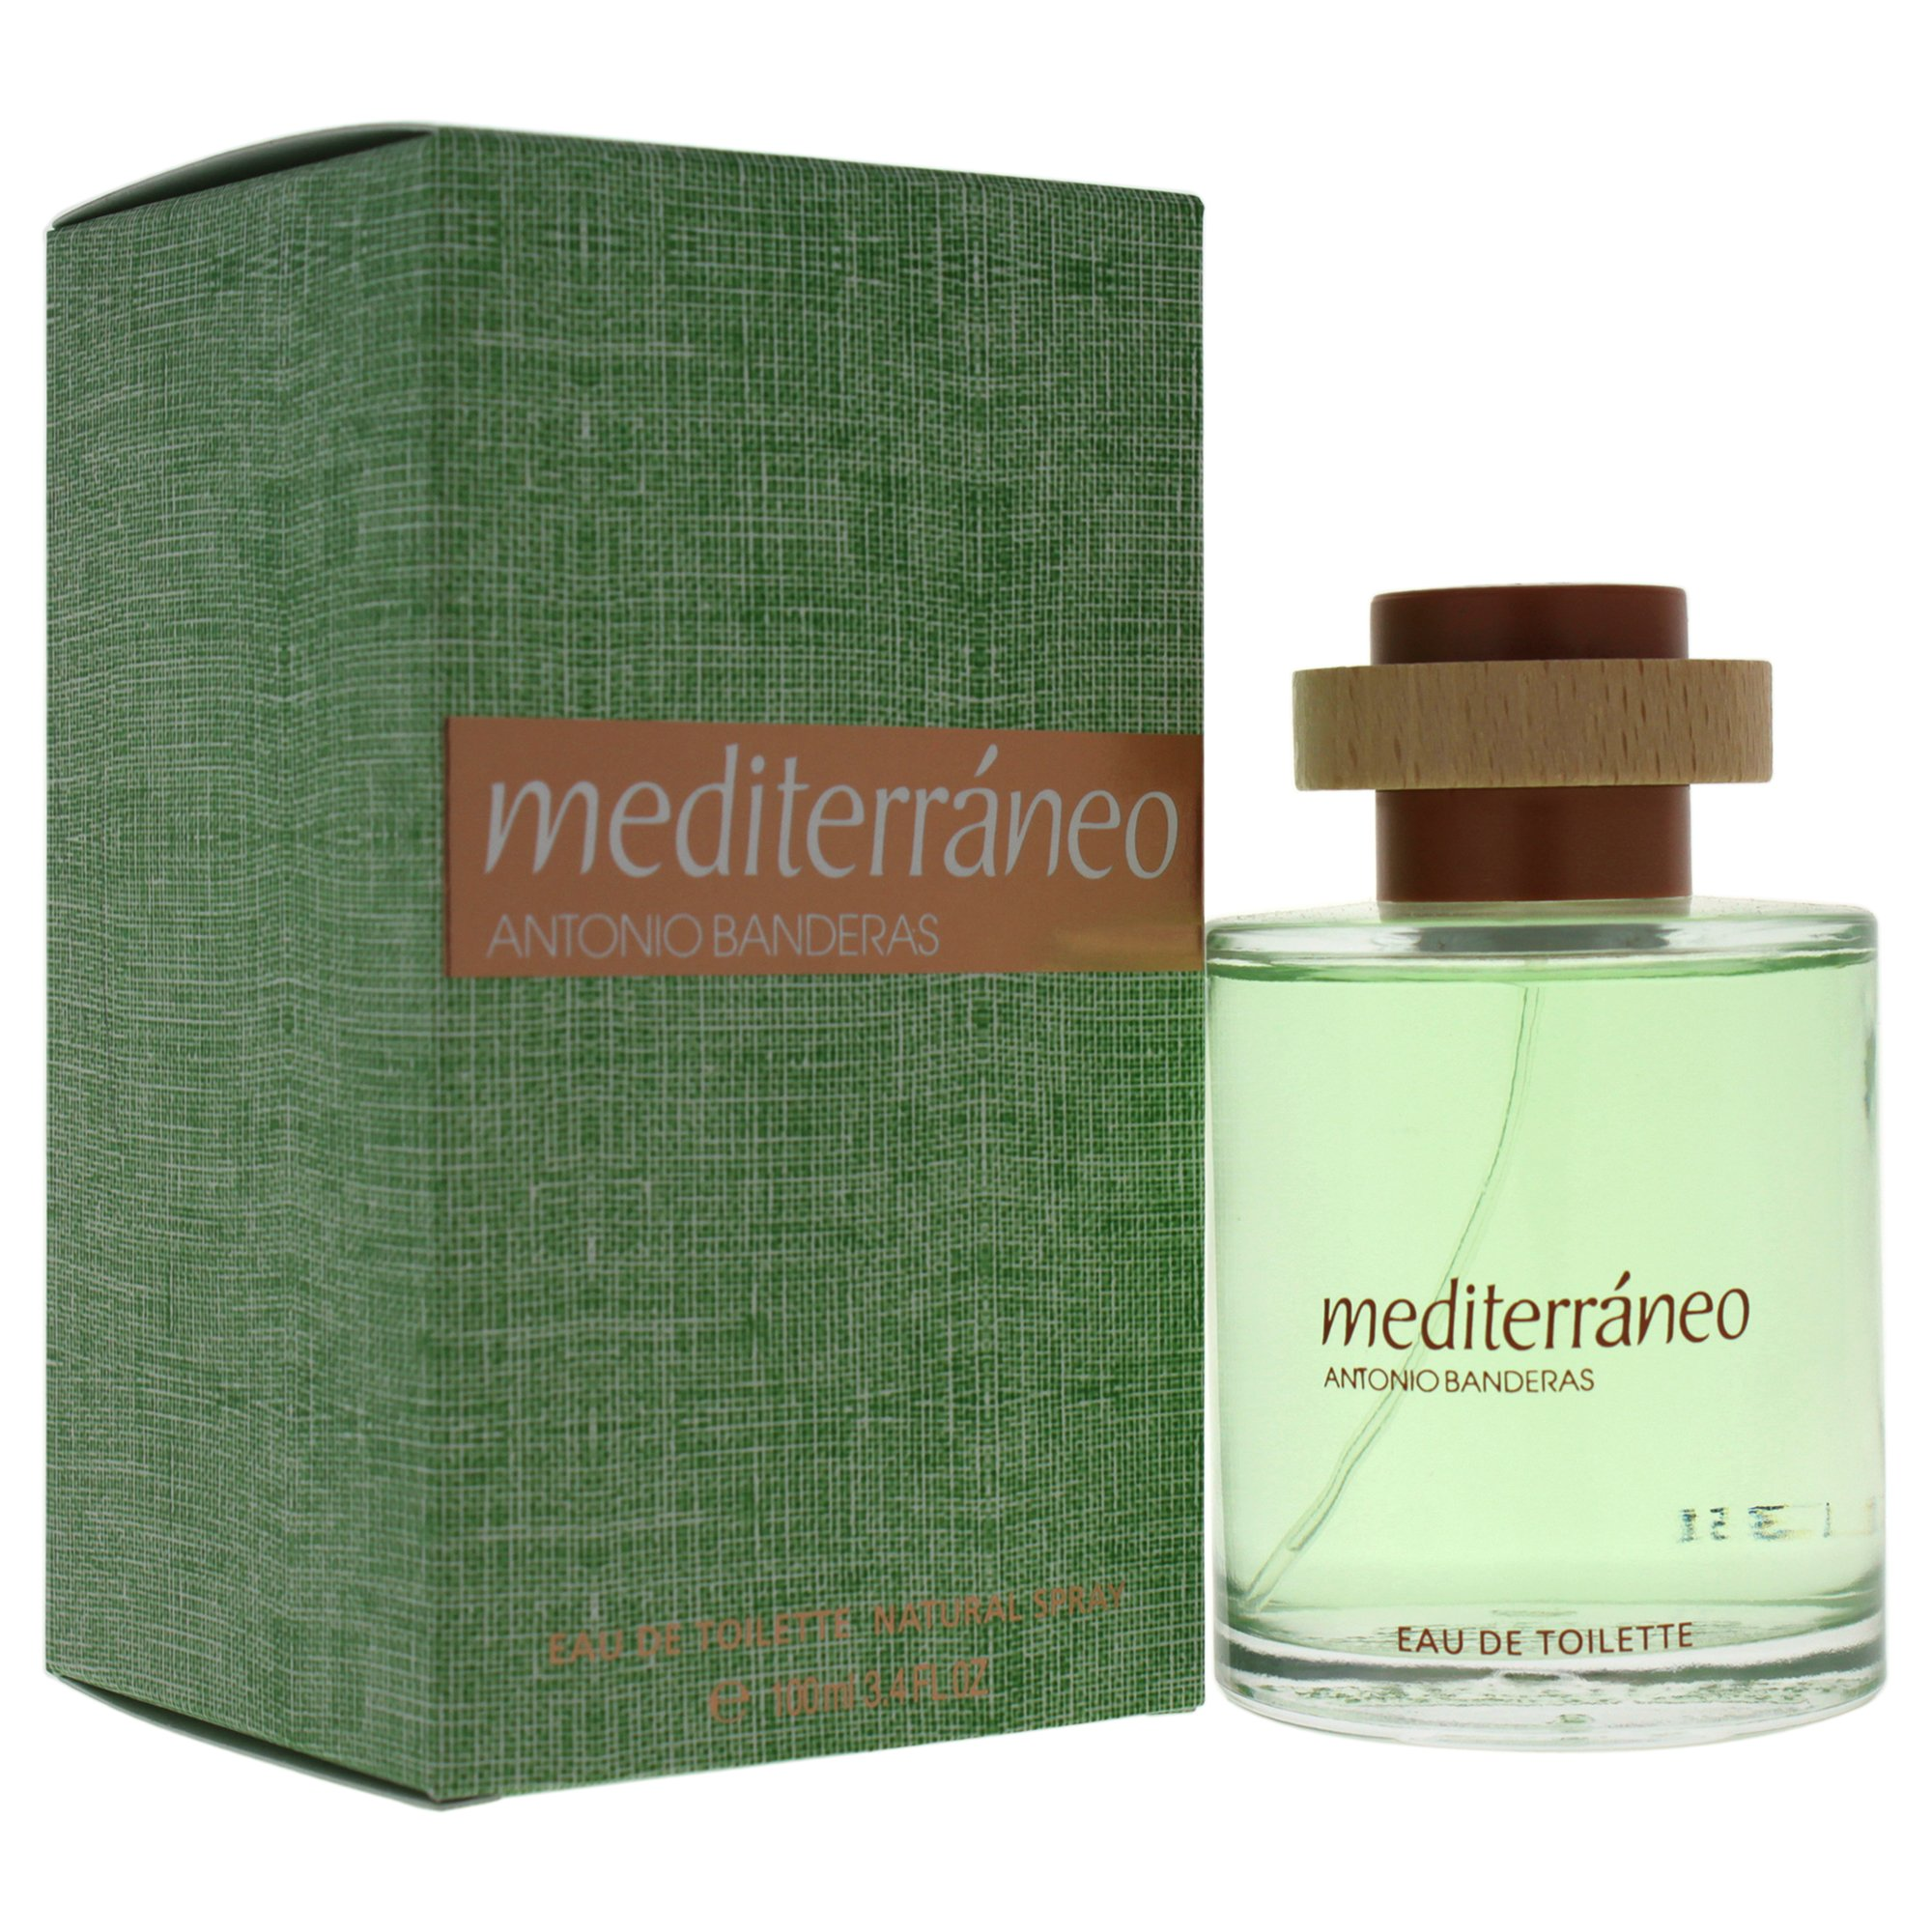 Perfume Mediterráneo Antonio Banderas Masculino Eau de Toilette 100 ml